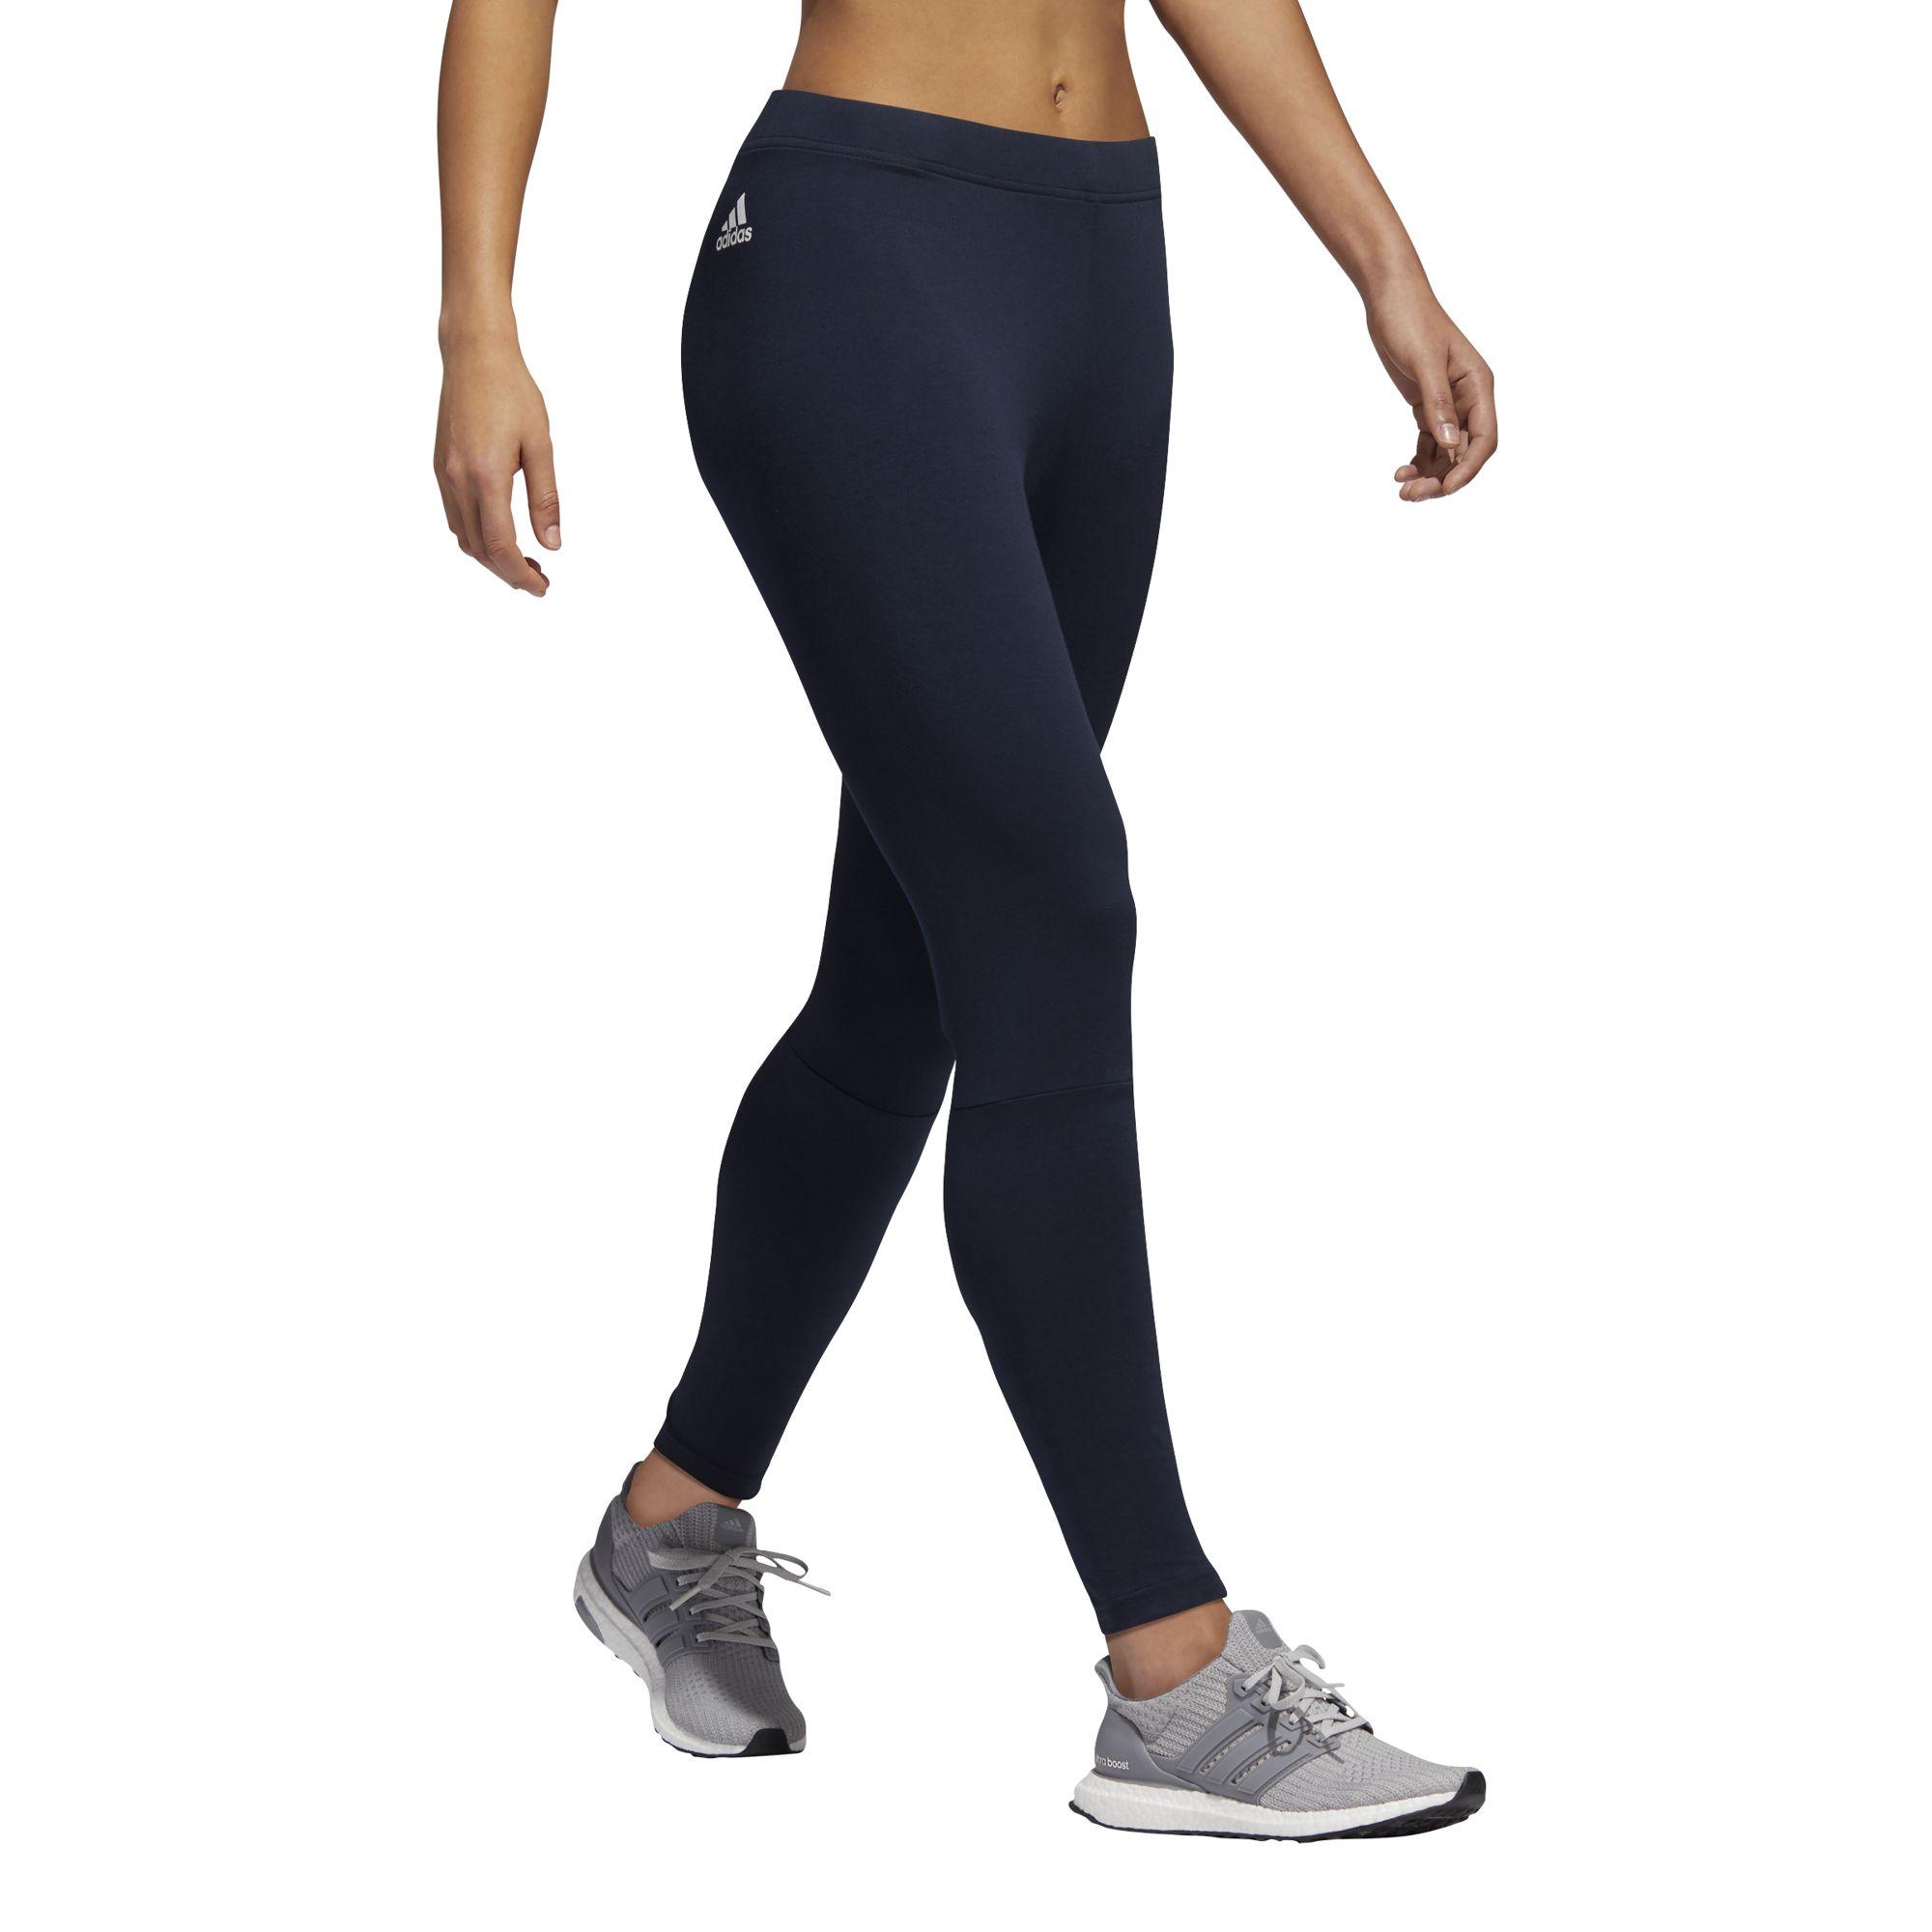 df82bd7140 Adidas női sportos leggings ESS LIN TIGHT | Markasbolt.hu Hivatalos ...